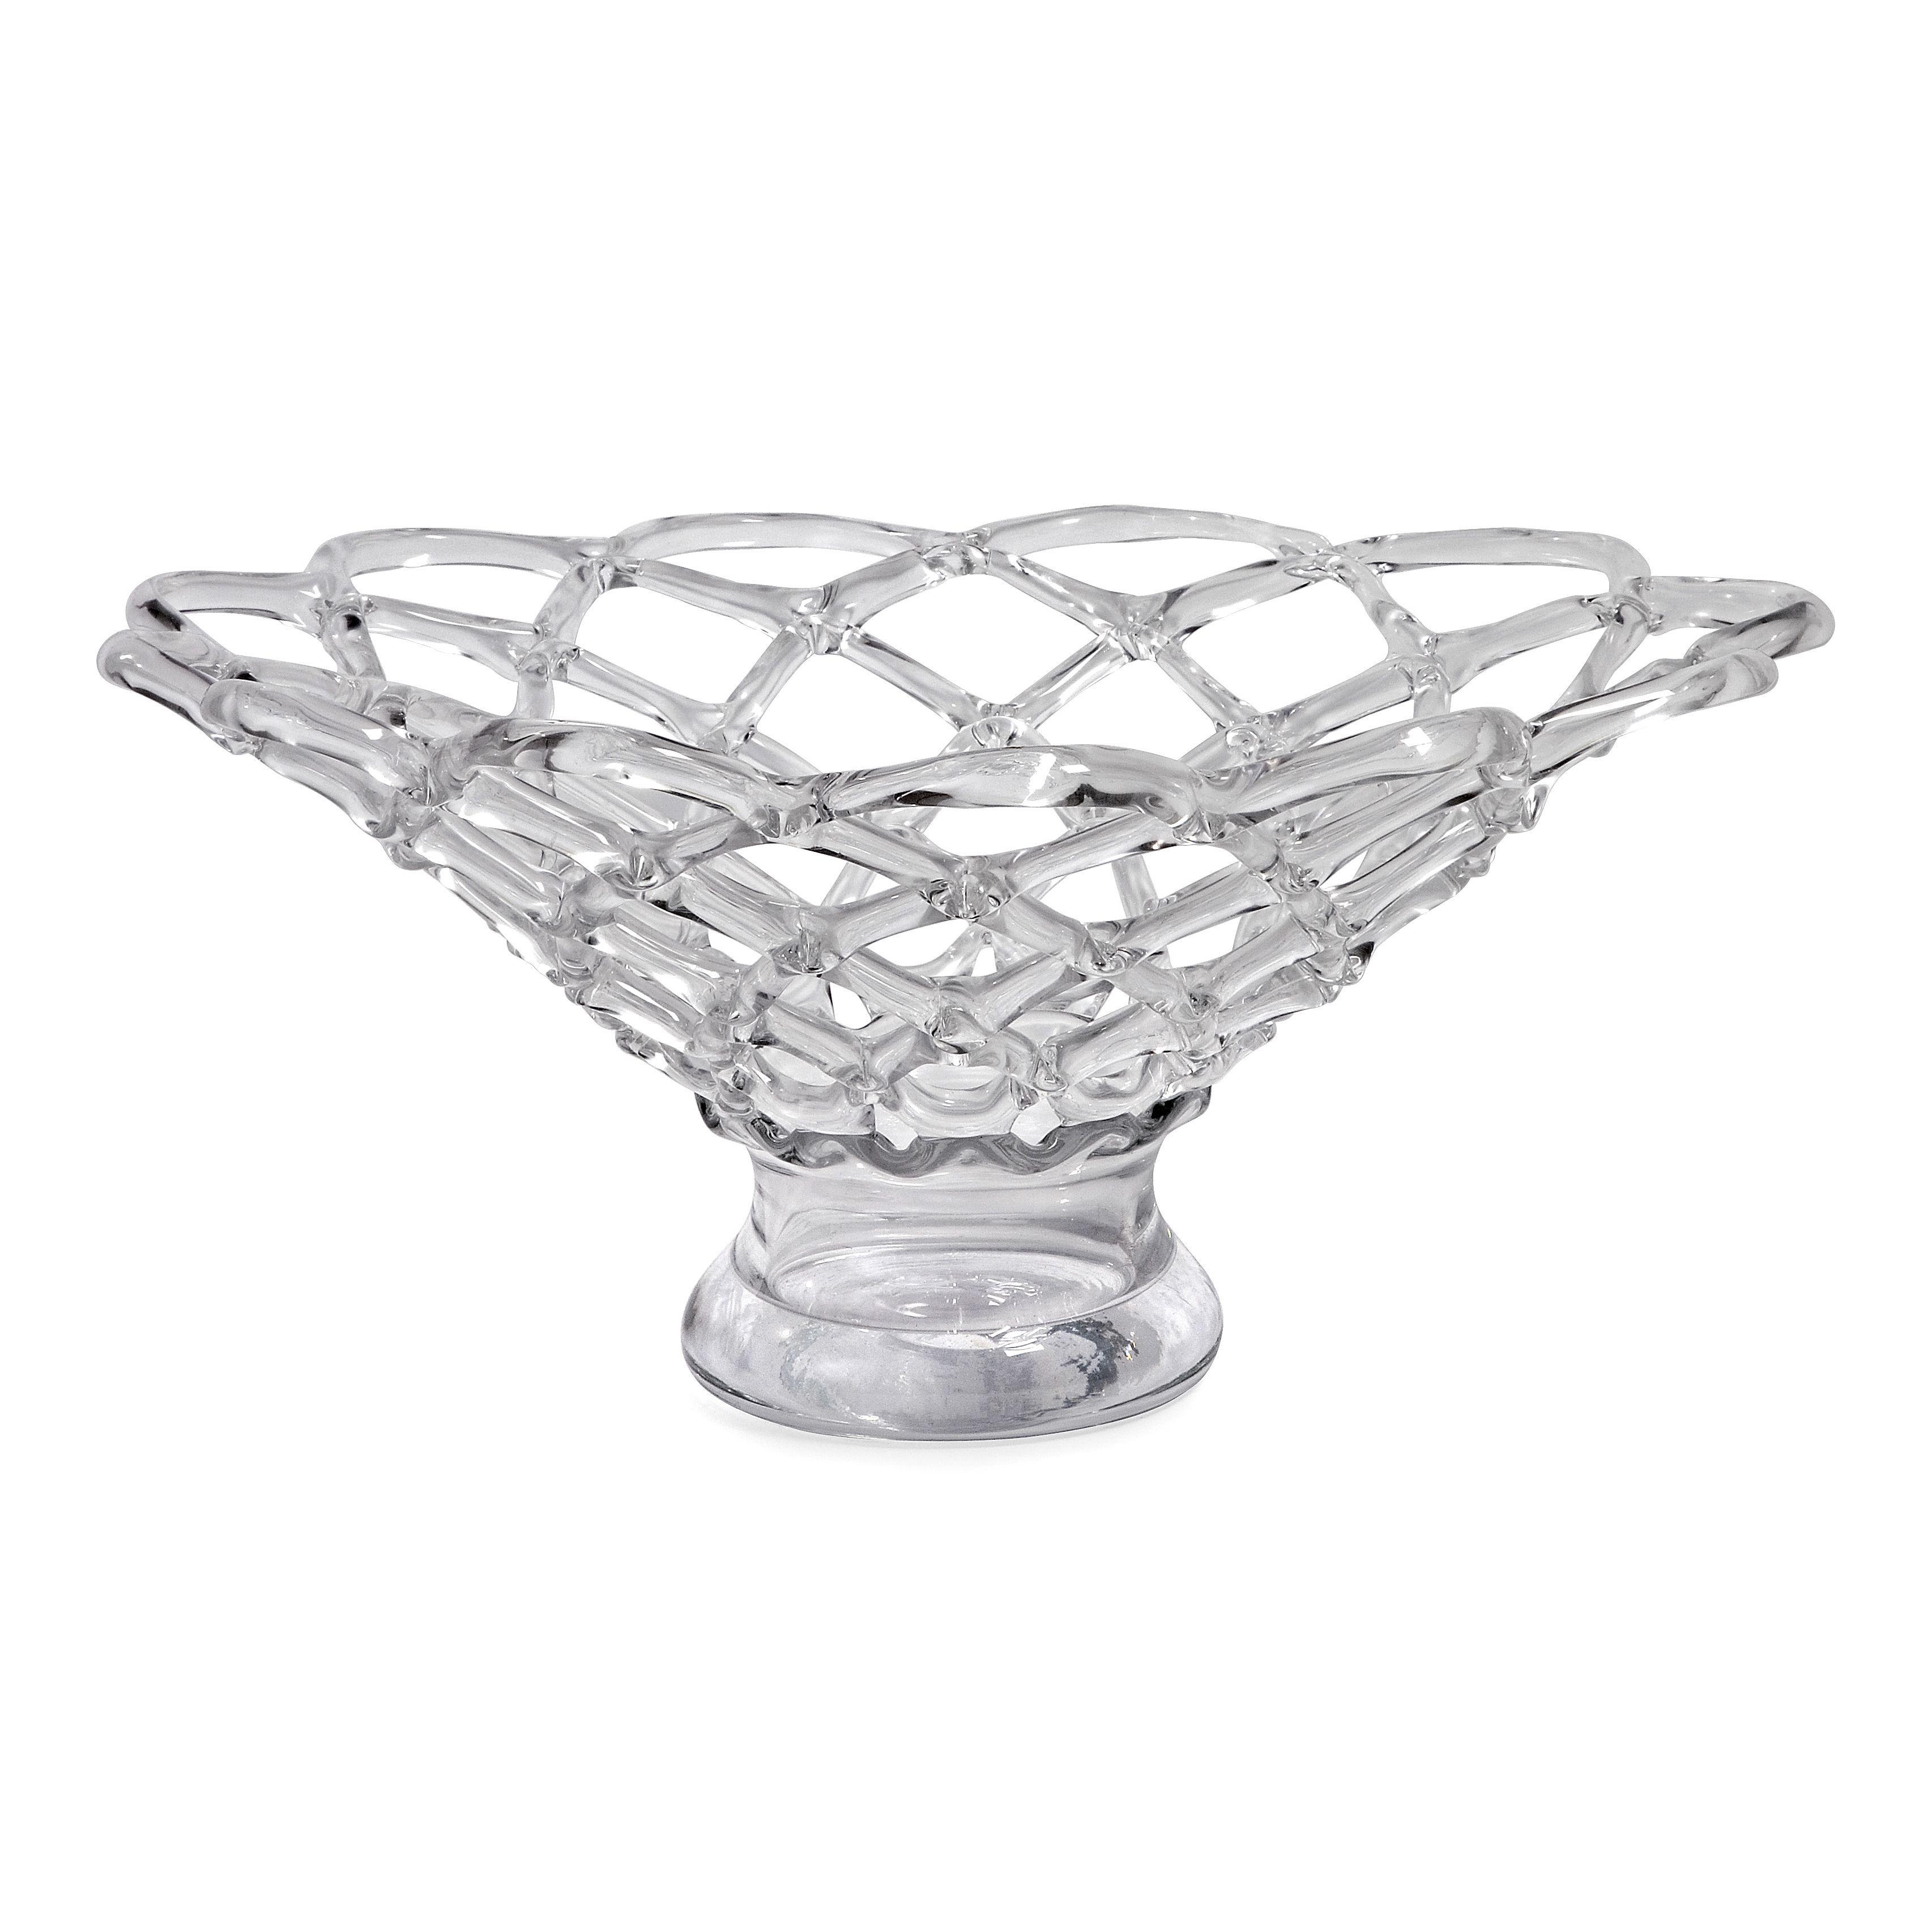 Imax Large Glass Web Bowl, Silver